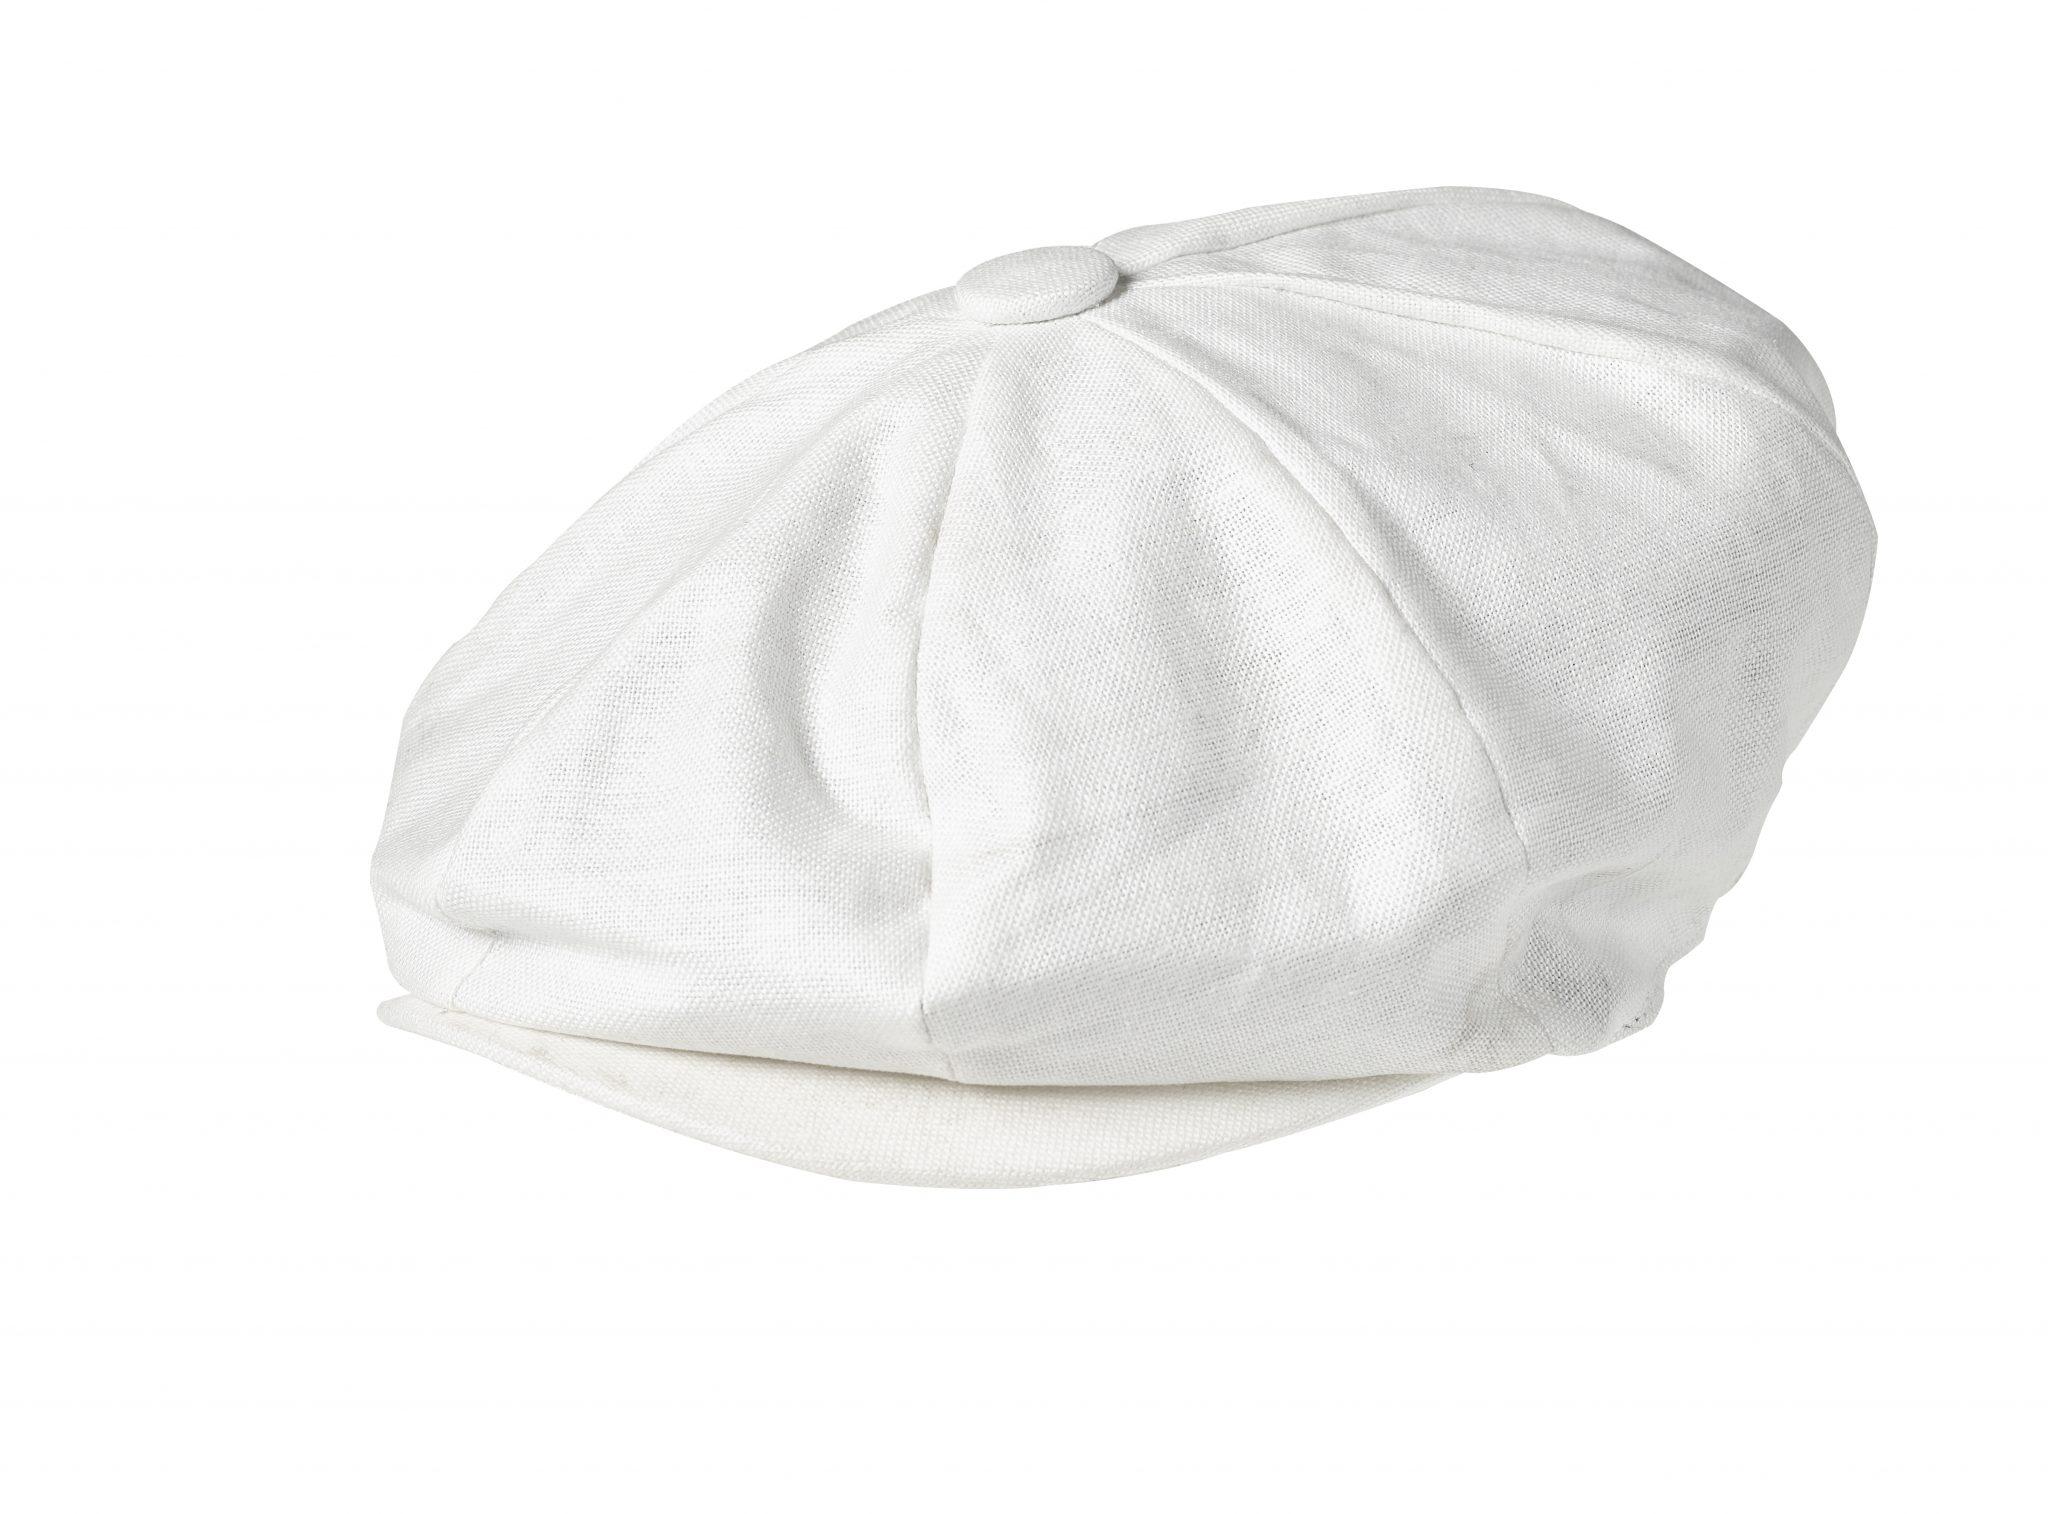 d7d82f165b9 Peaky Blinders 100% Linen 8 Piece Newsboy Cap White Summer Style